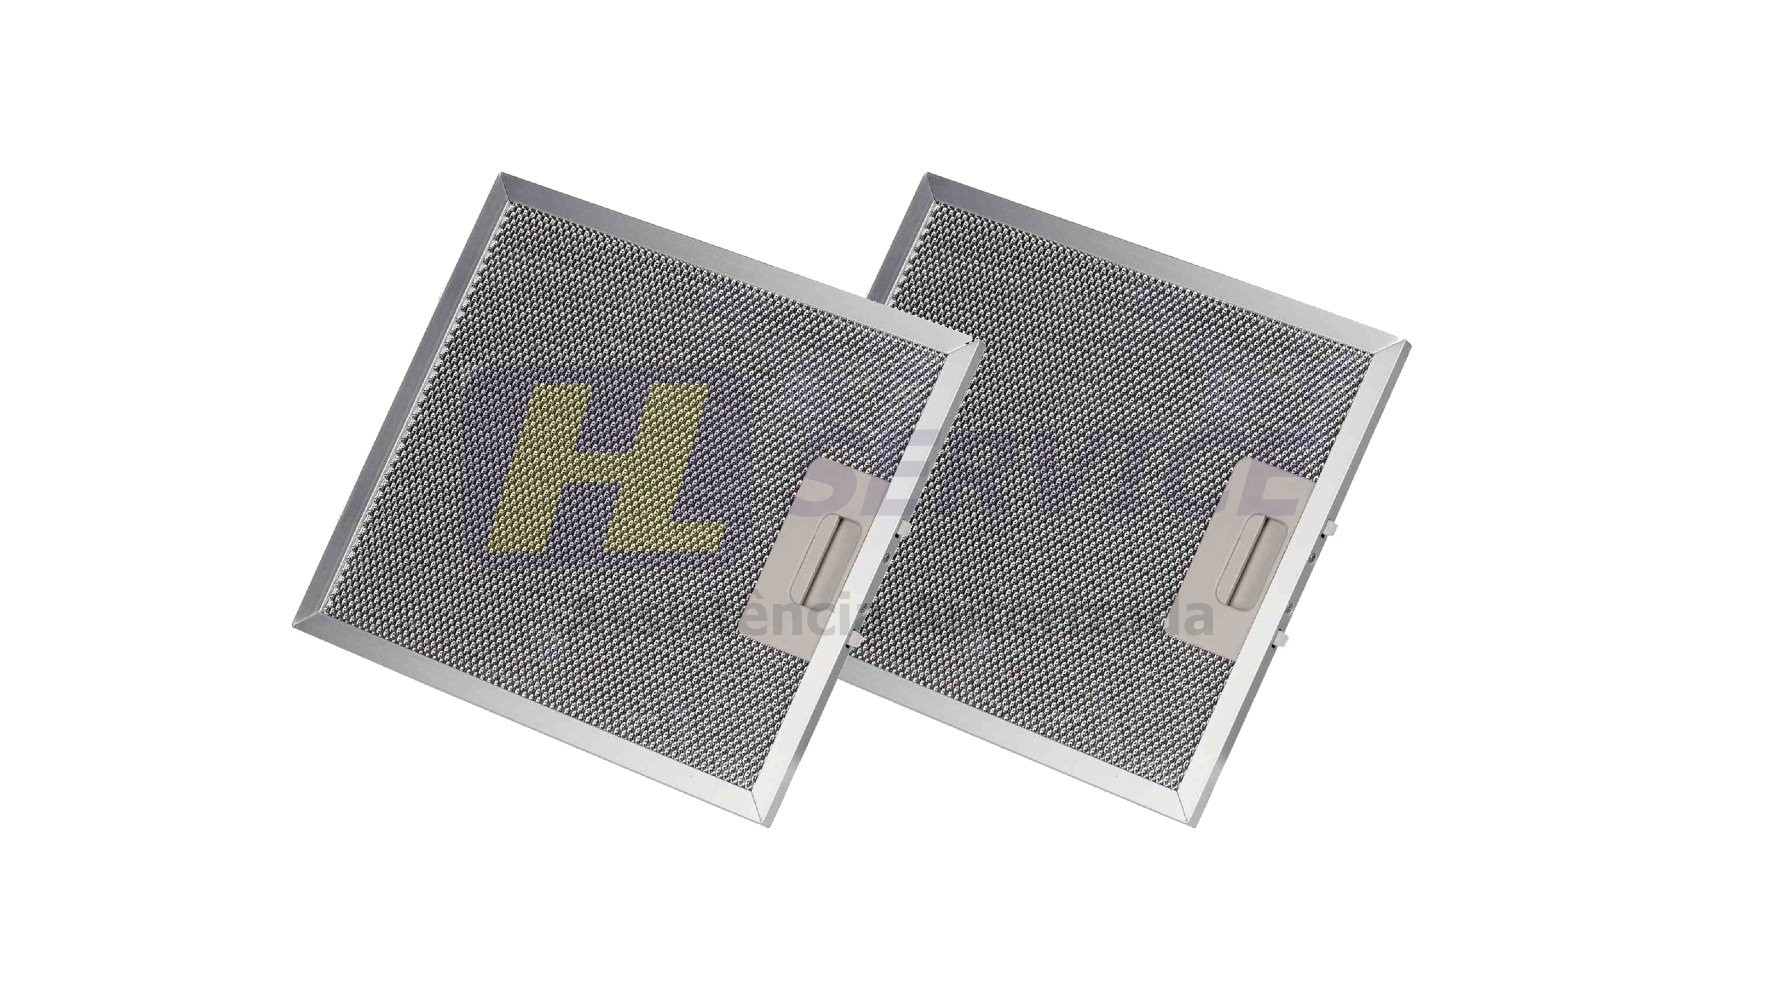 Filtro Alumínio Coifa Cata | 26 X 32 Cm | 2 Peças